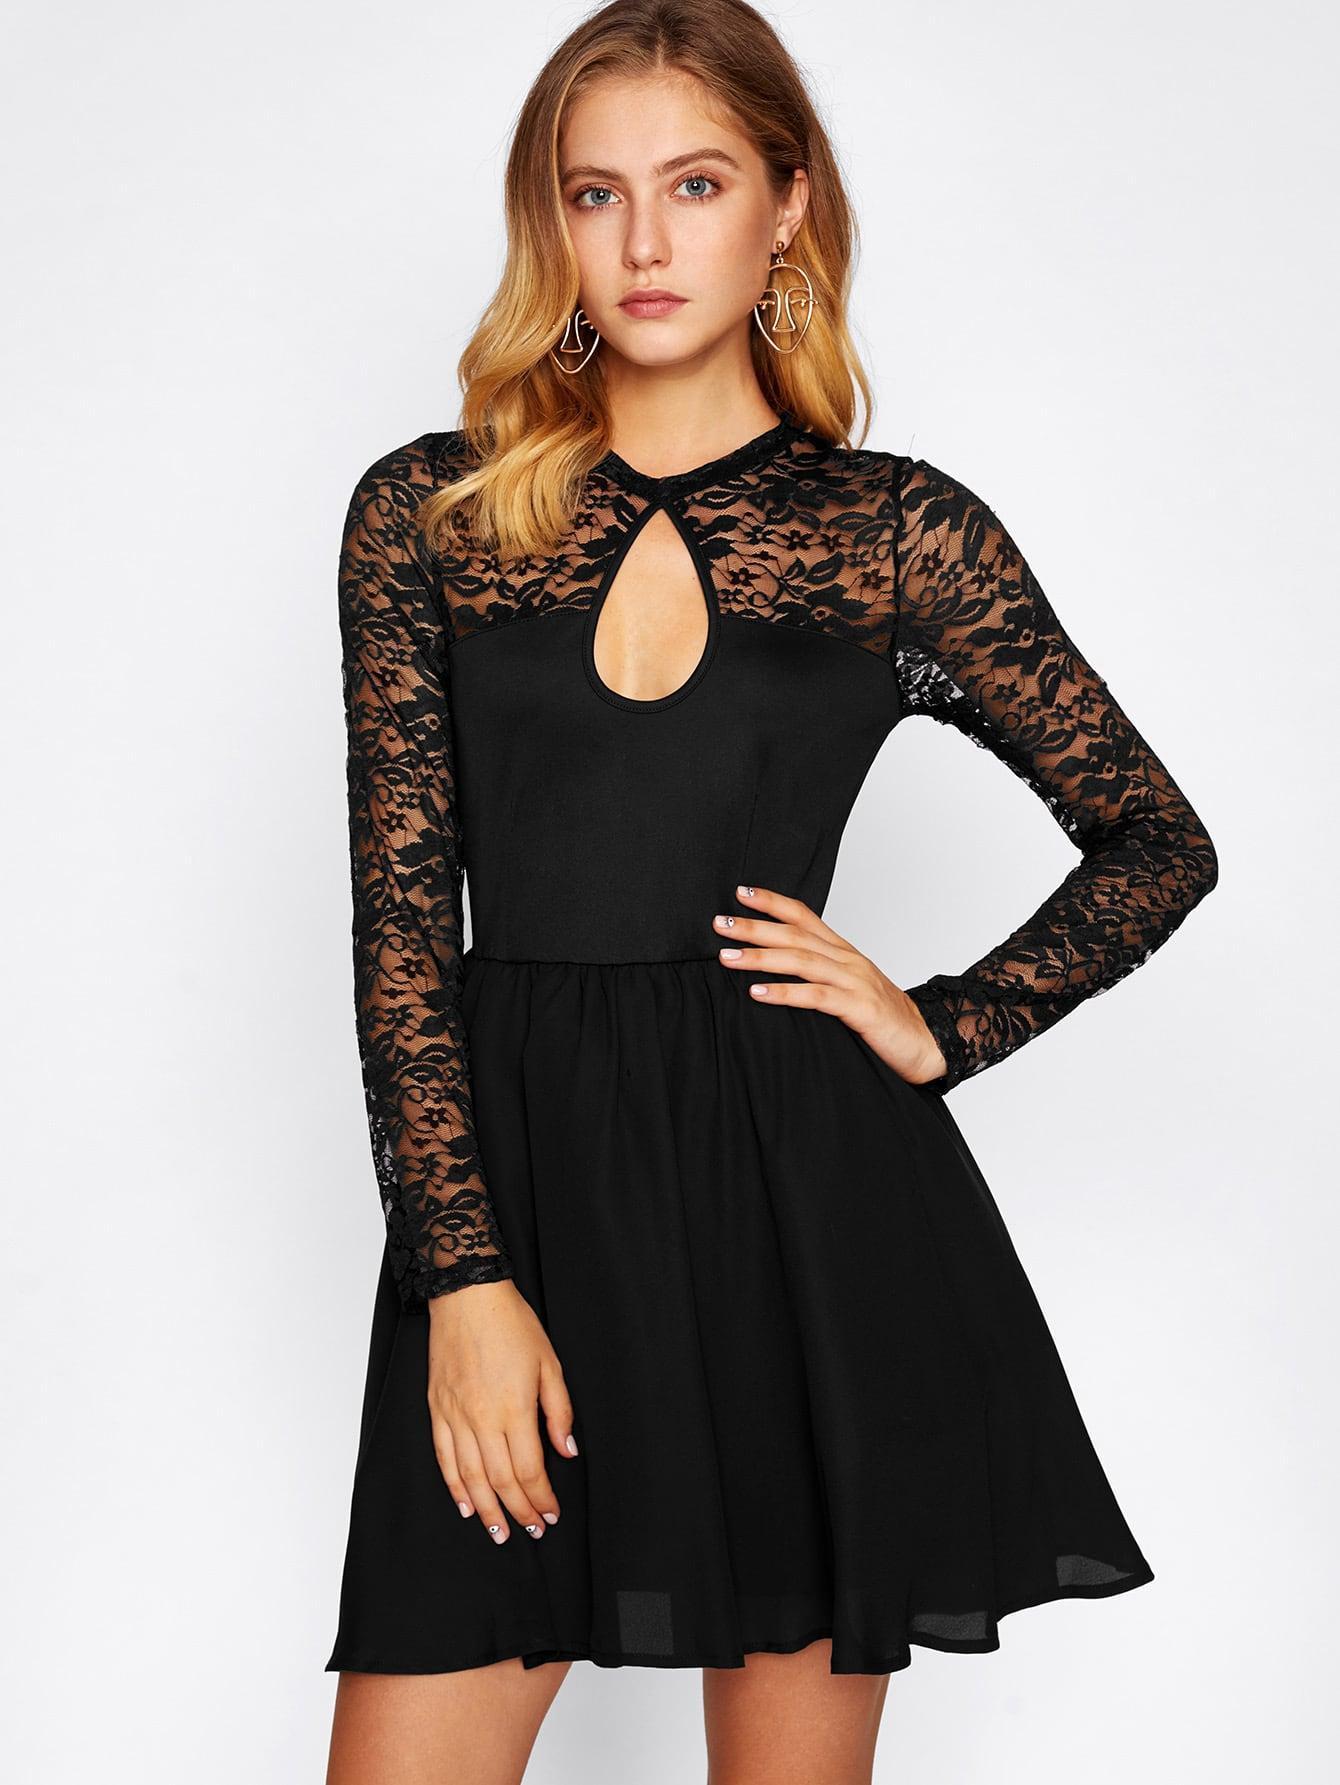 Lace Yoke Cutout Skater Dress floral lace yoke skater dress